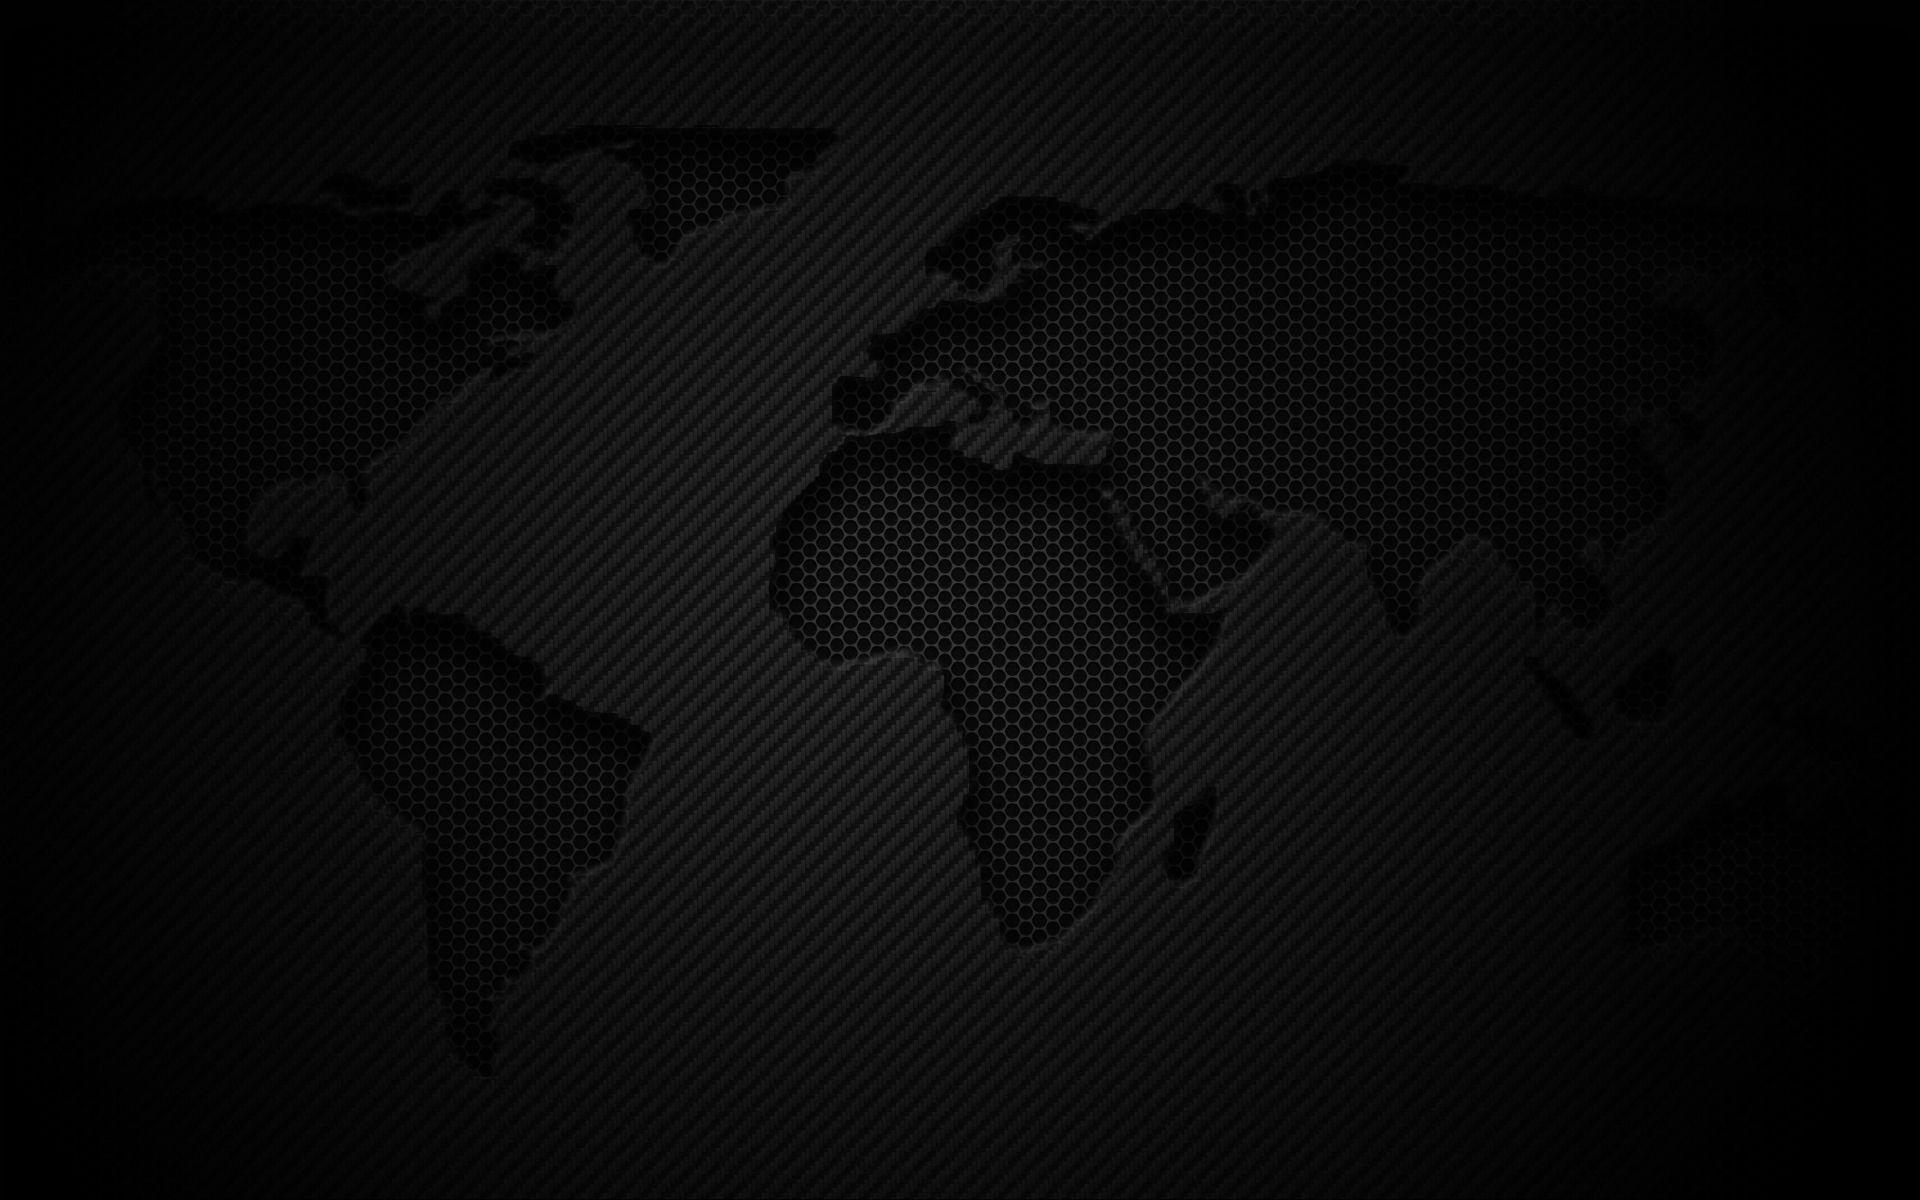 Black Desktop Wallpapers Top Free Black Desktop